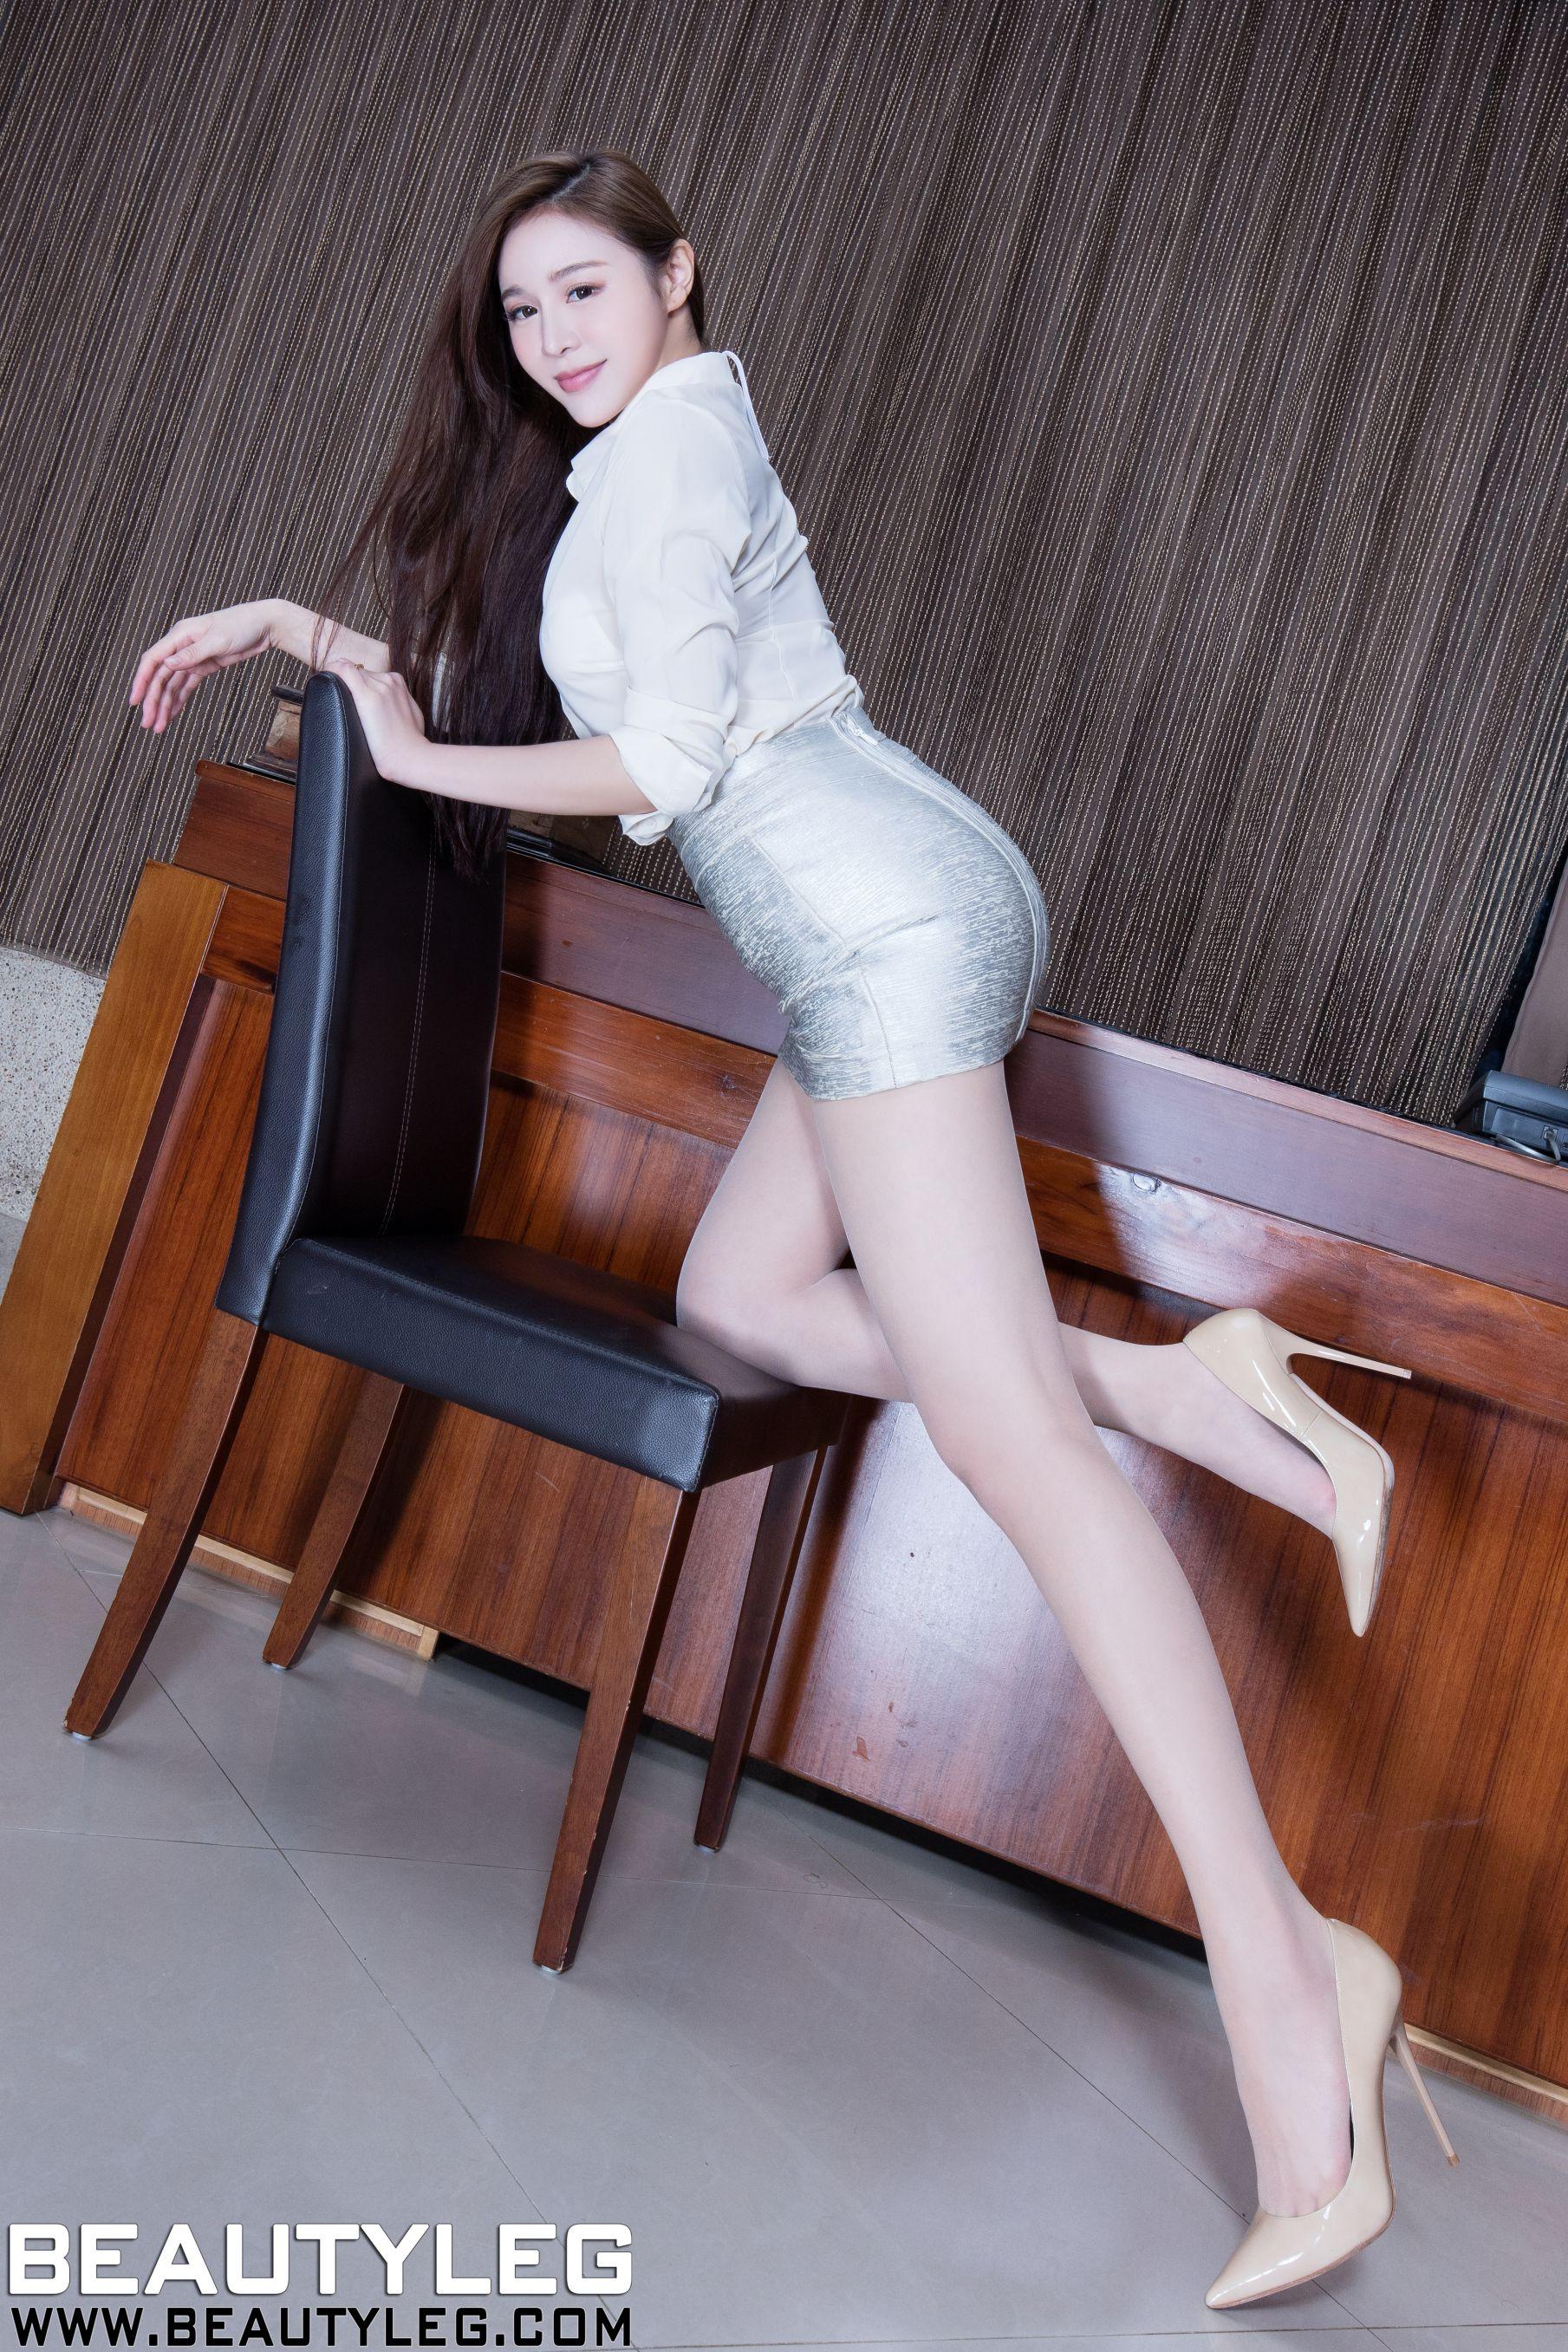 VOL.1861 [Beautyleg]OL美女包臀裙美女长腿美女:腿模Lena(Lena)高品质写真套图(47P)